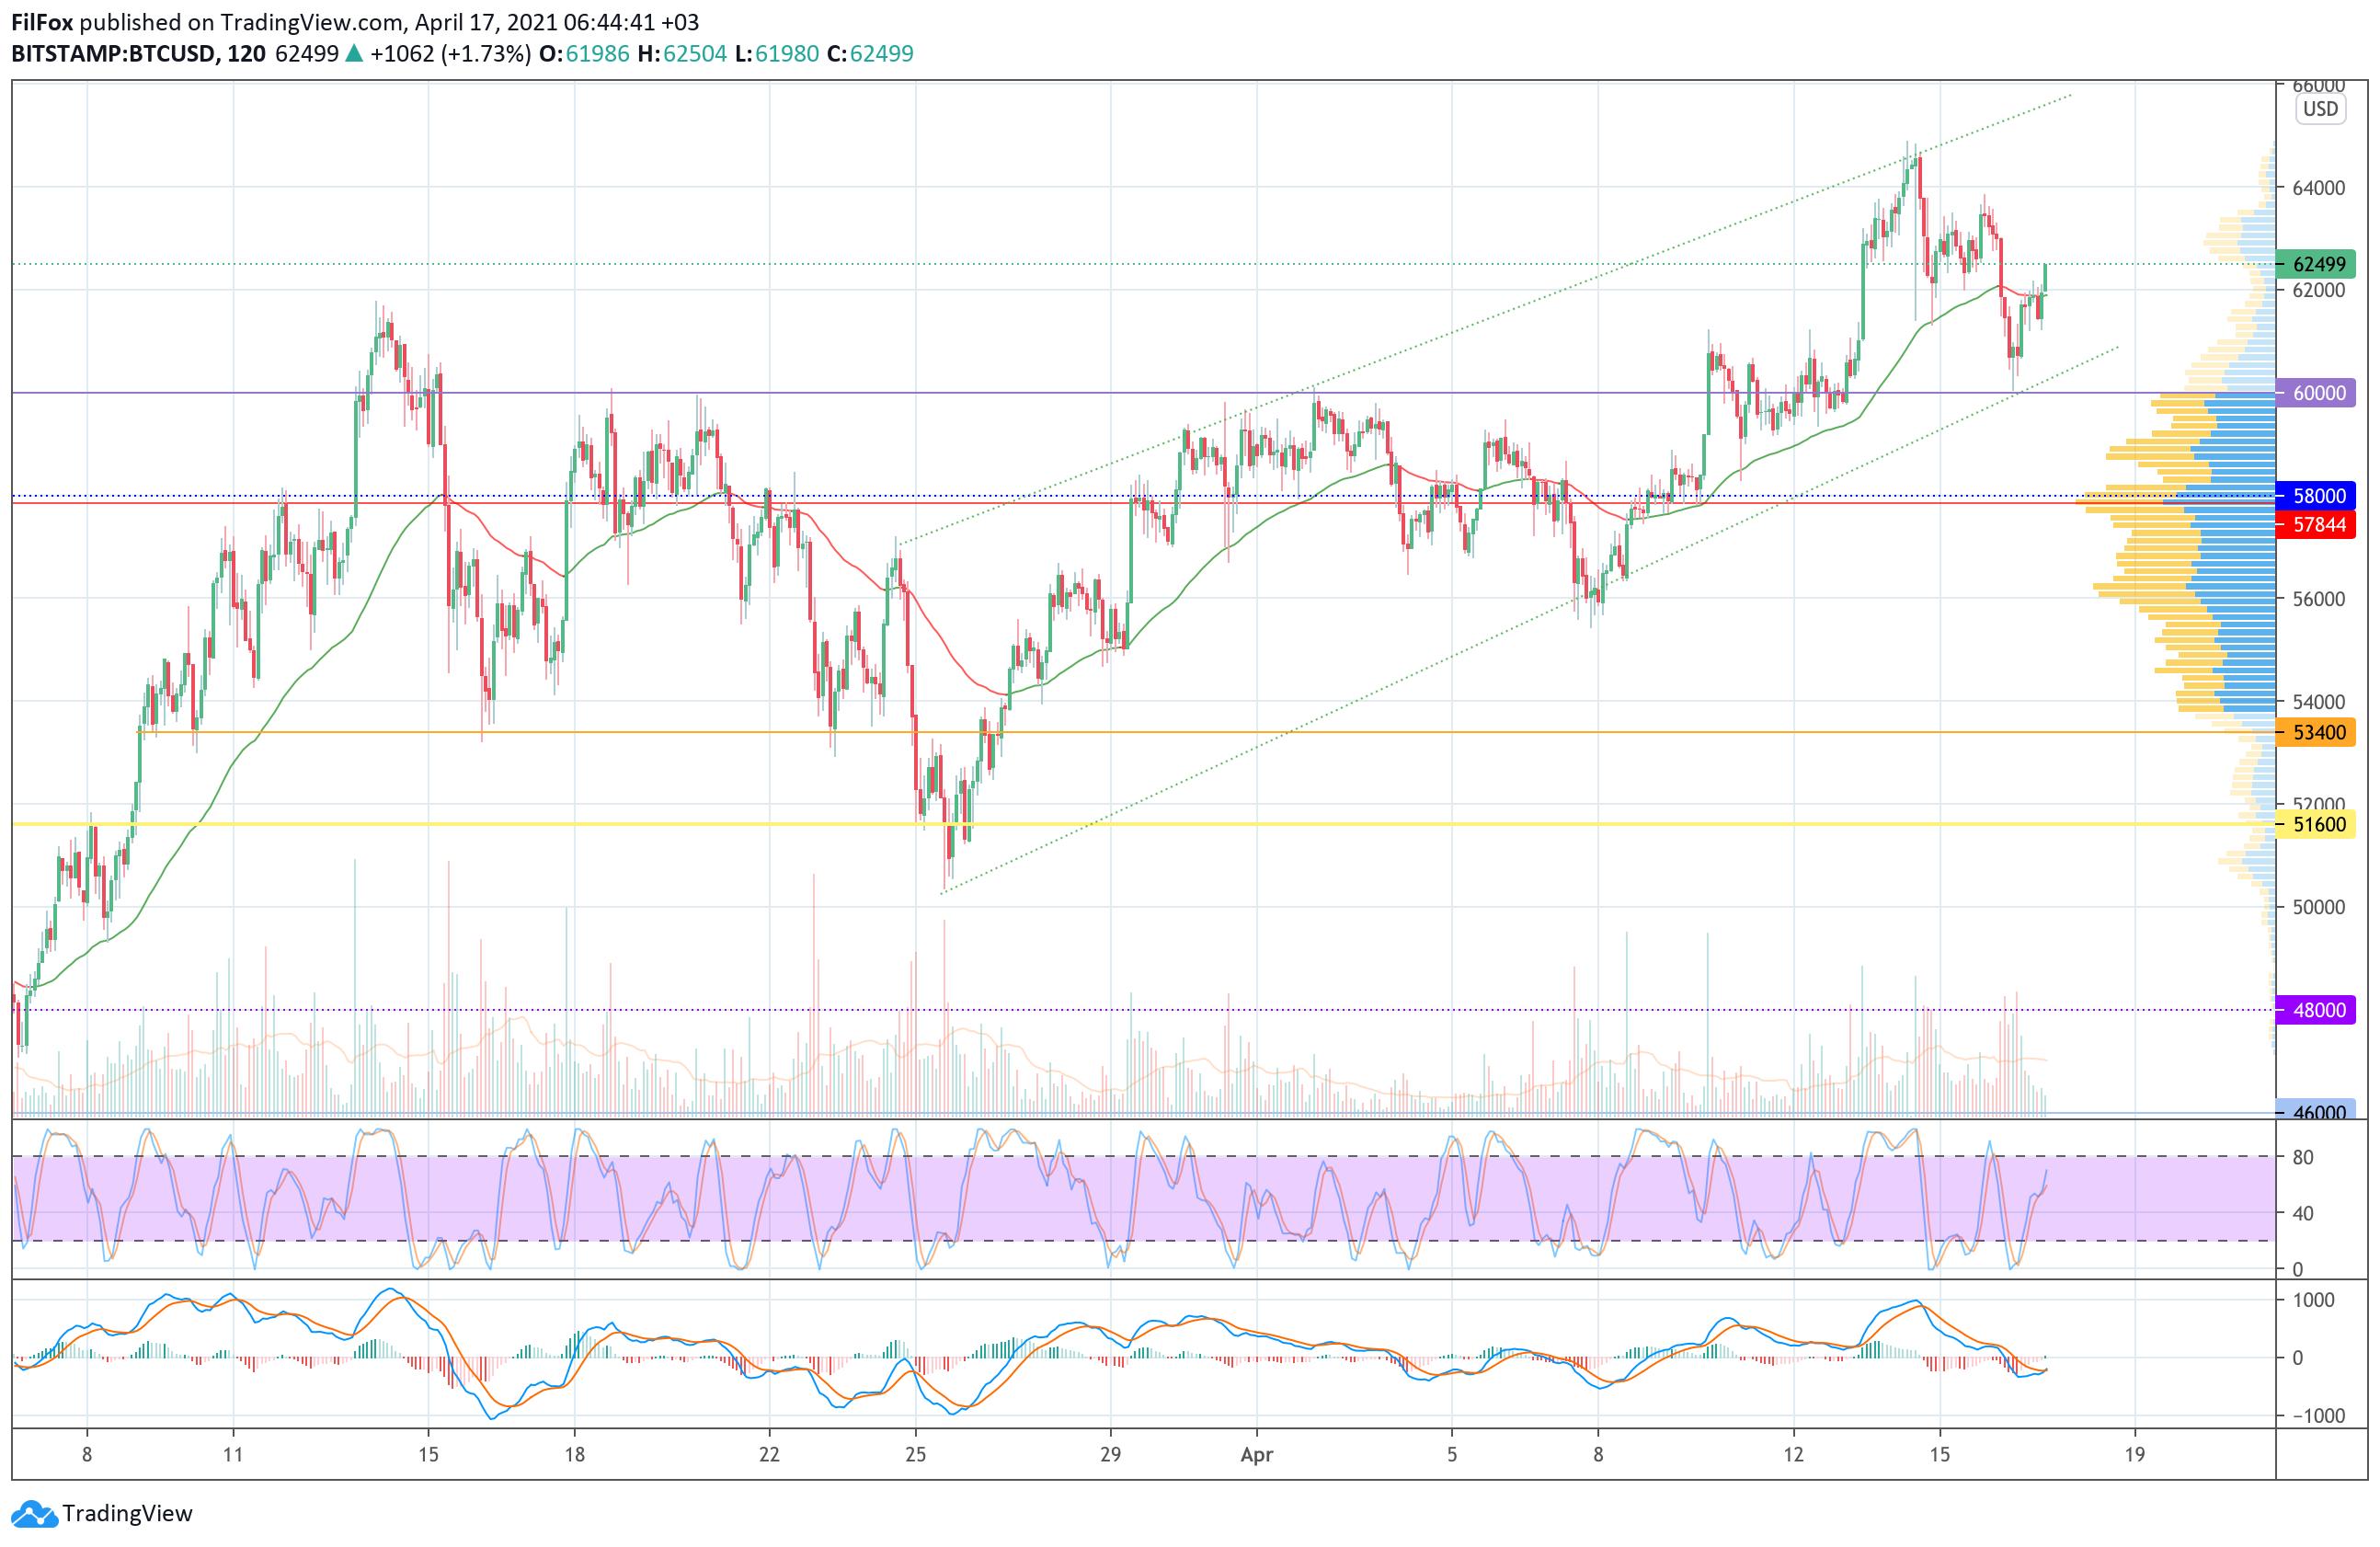 006711 - Анализ цен Bitcoin, Ethereum, XRP на 17.04.2021